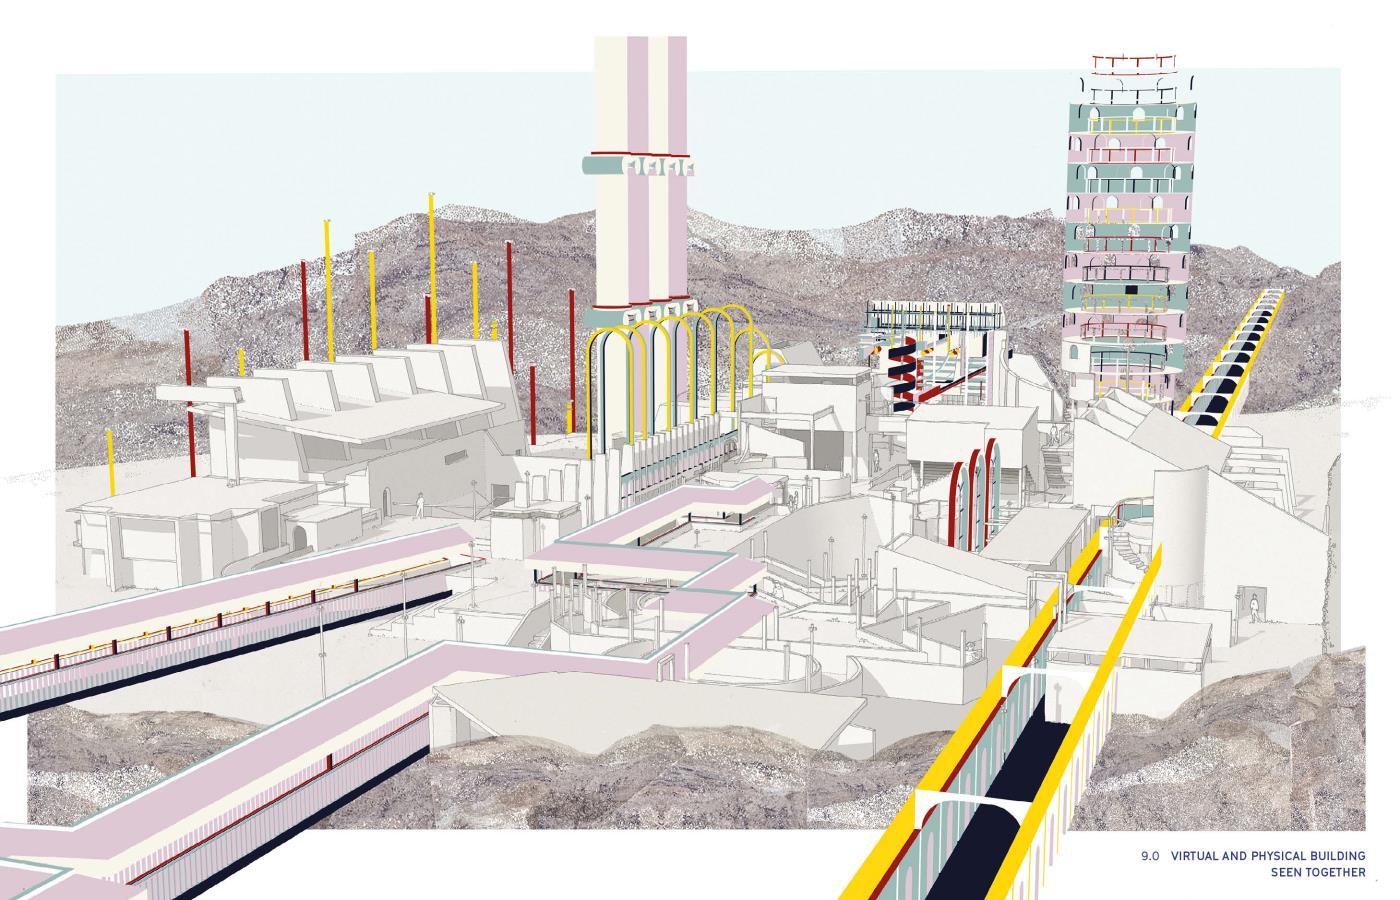 Ascaya City Hall: Constructing a virtual civic image